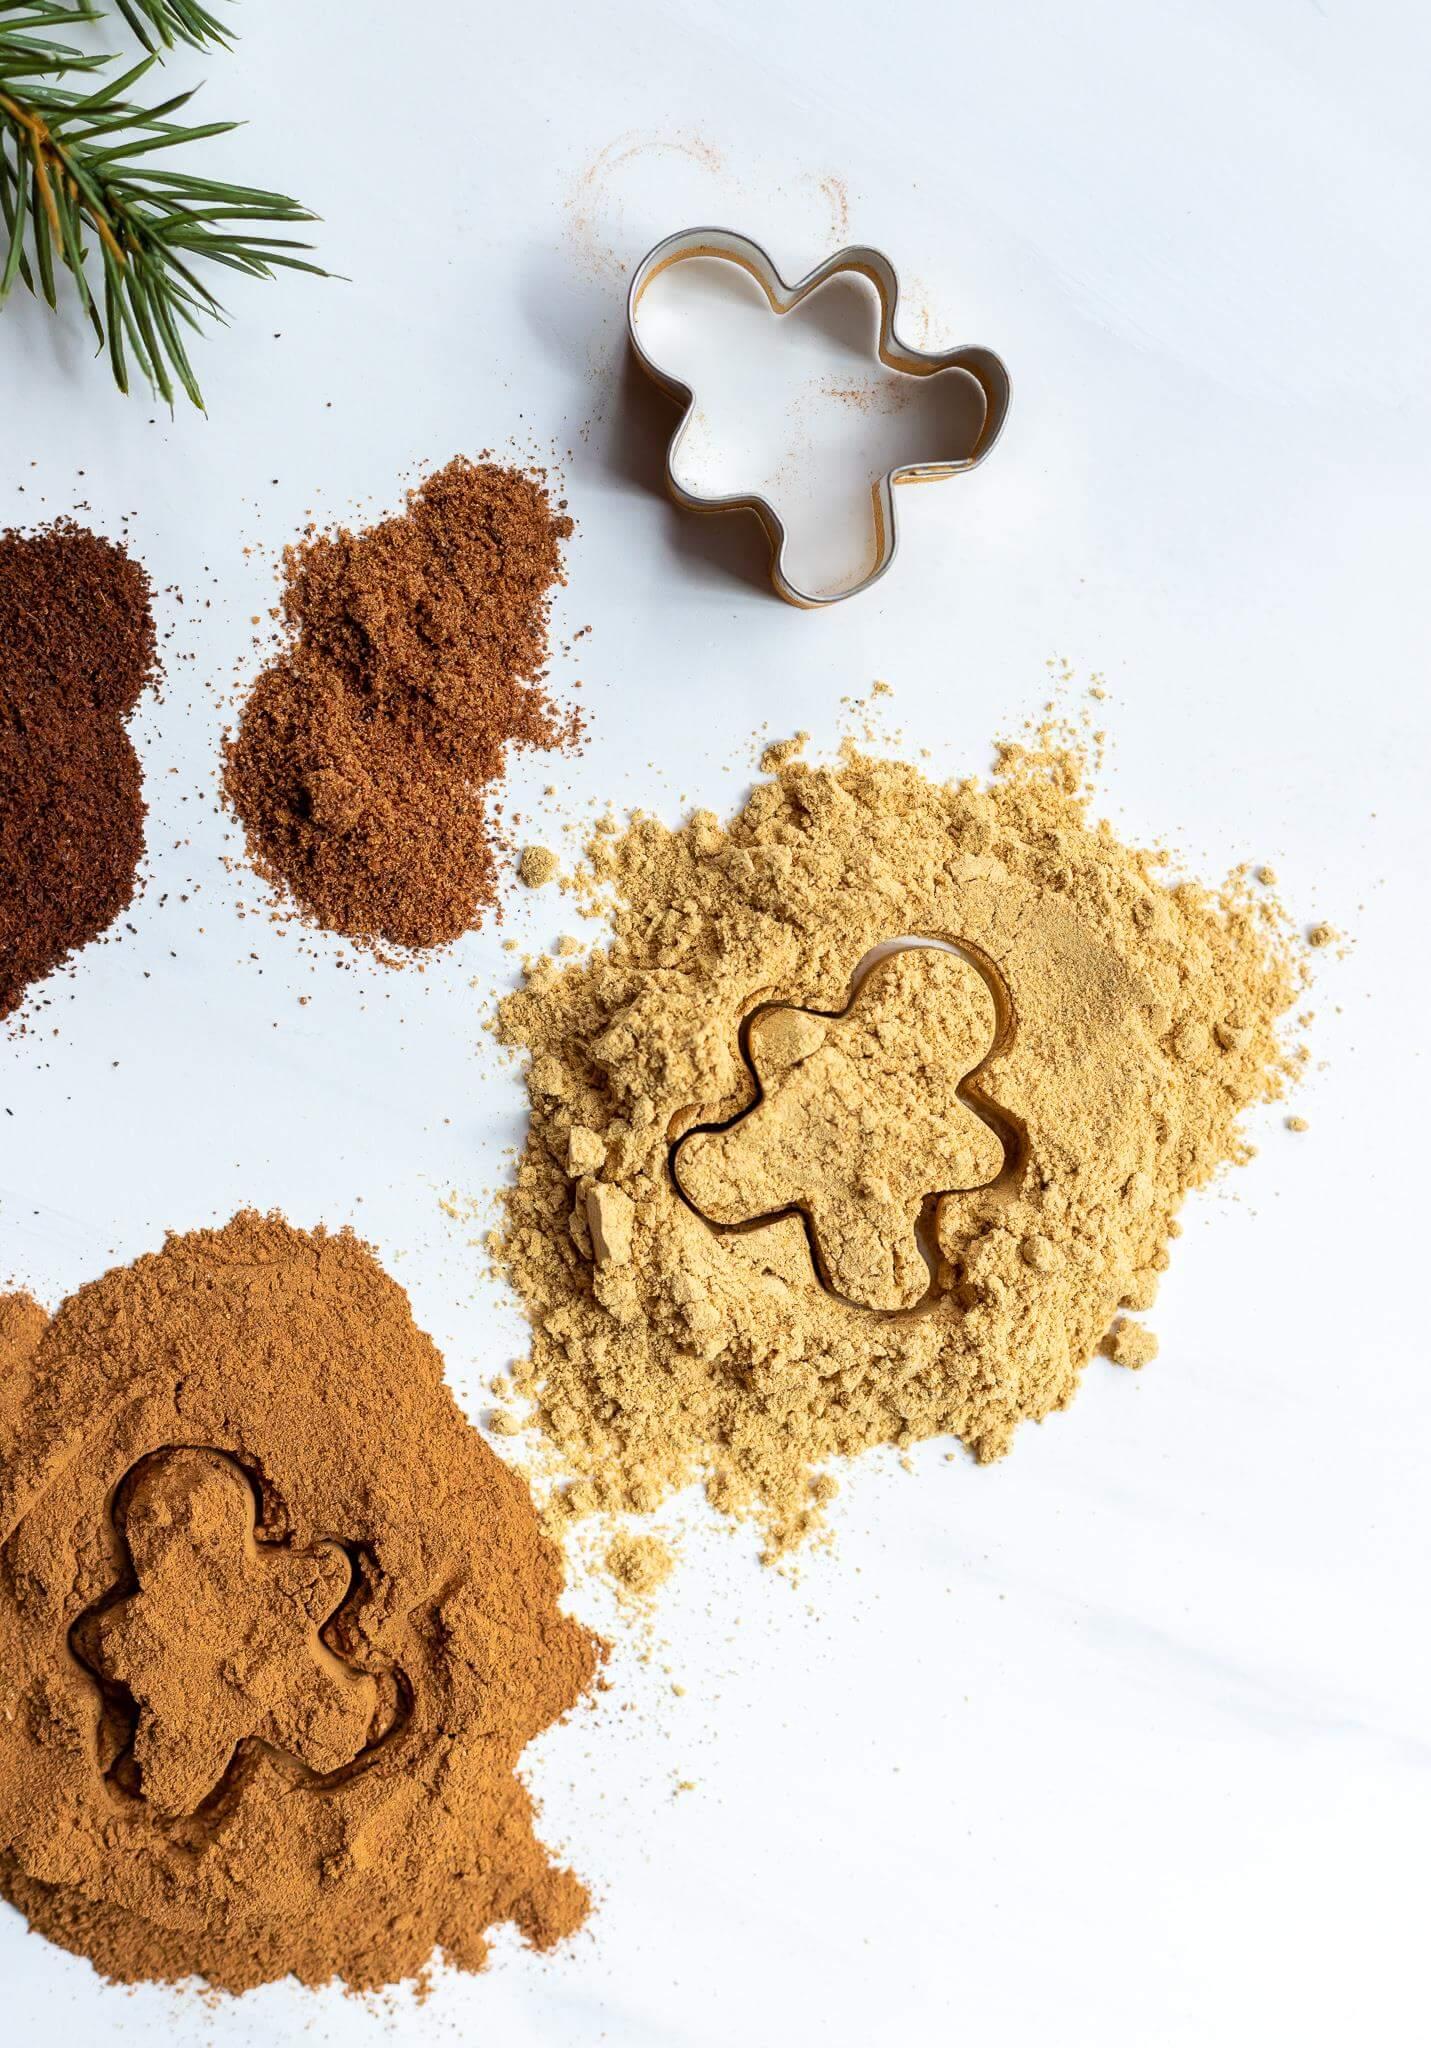 gingerbread spice mix alongside a mini gingerbread man cookie cutter